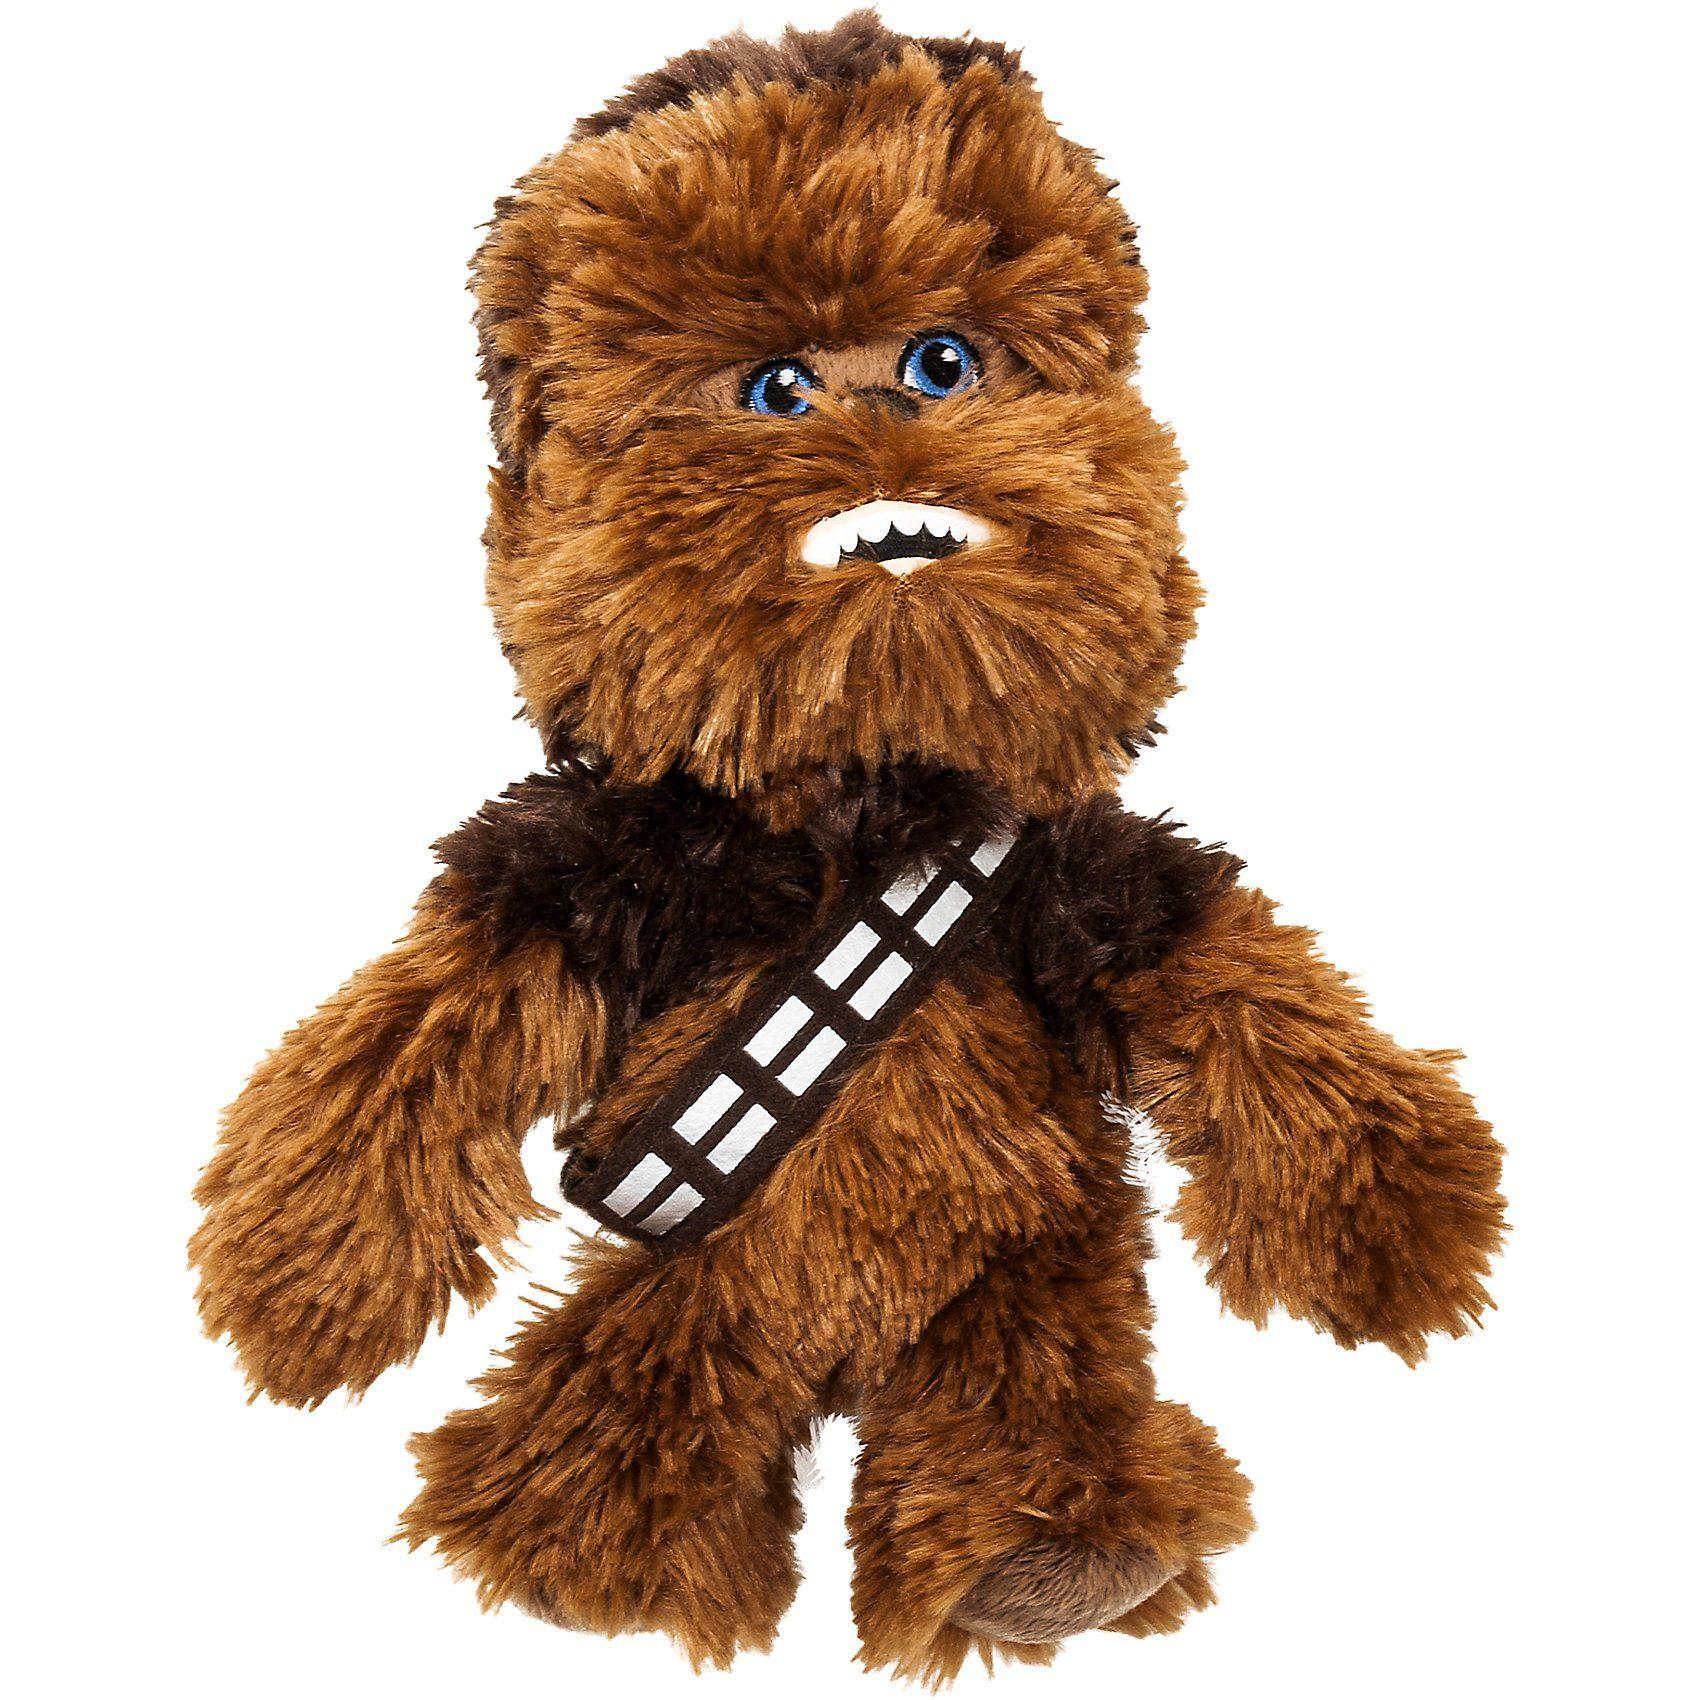 JOY TOY Velboa-Samtplüsch Chewbacca Star Wars, 20 cm